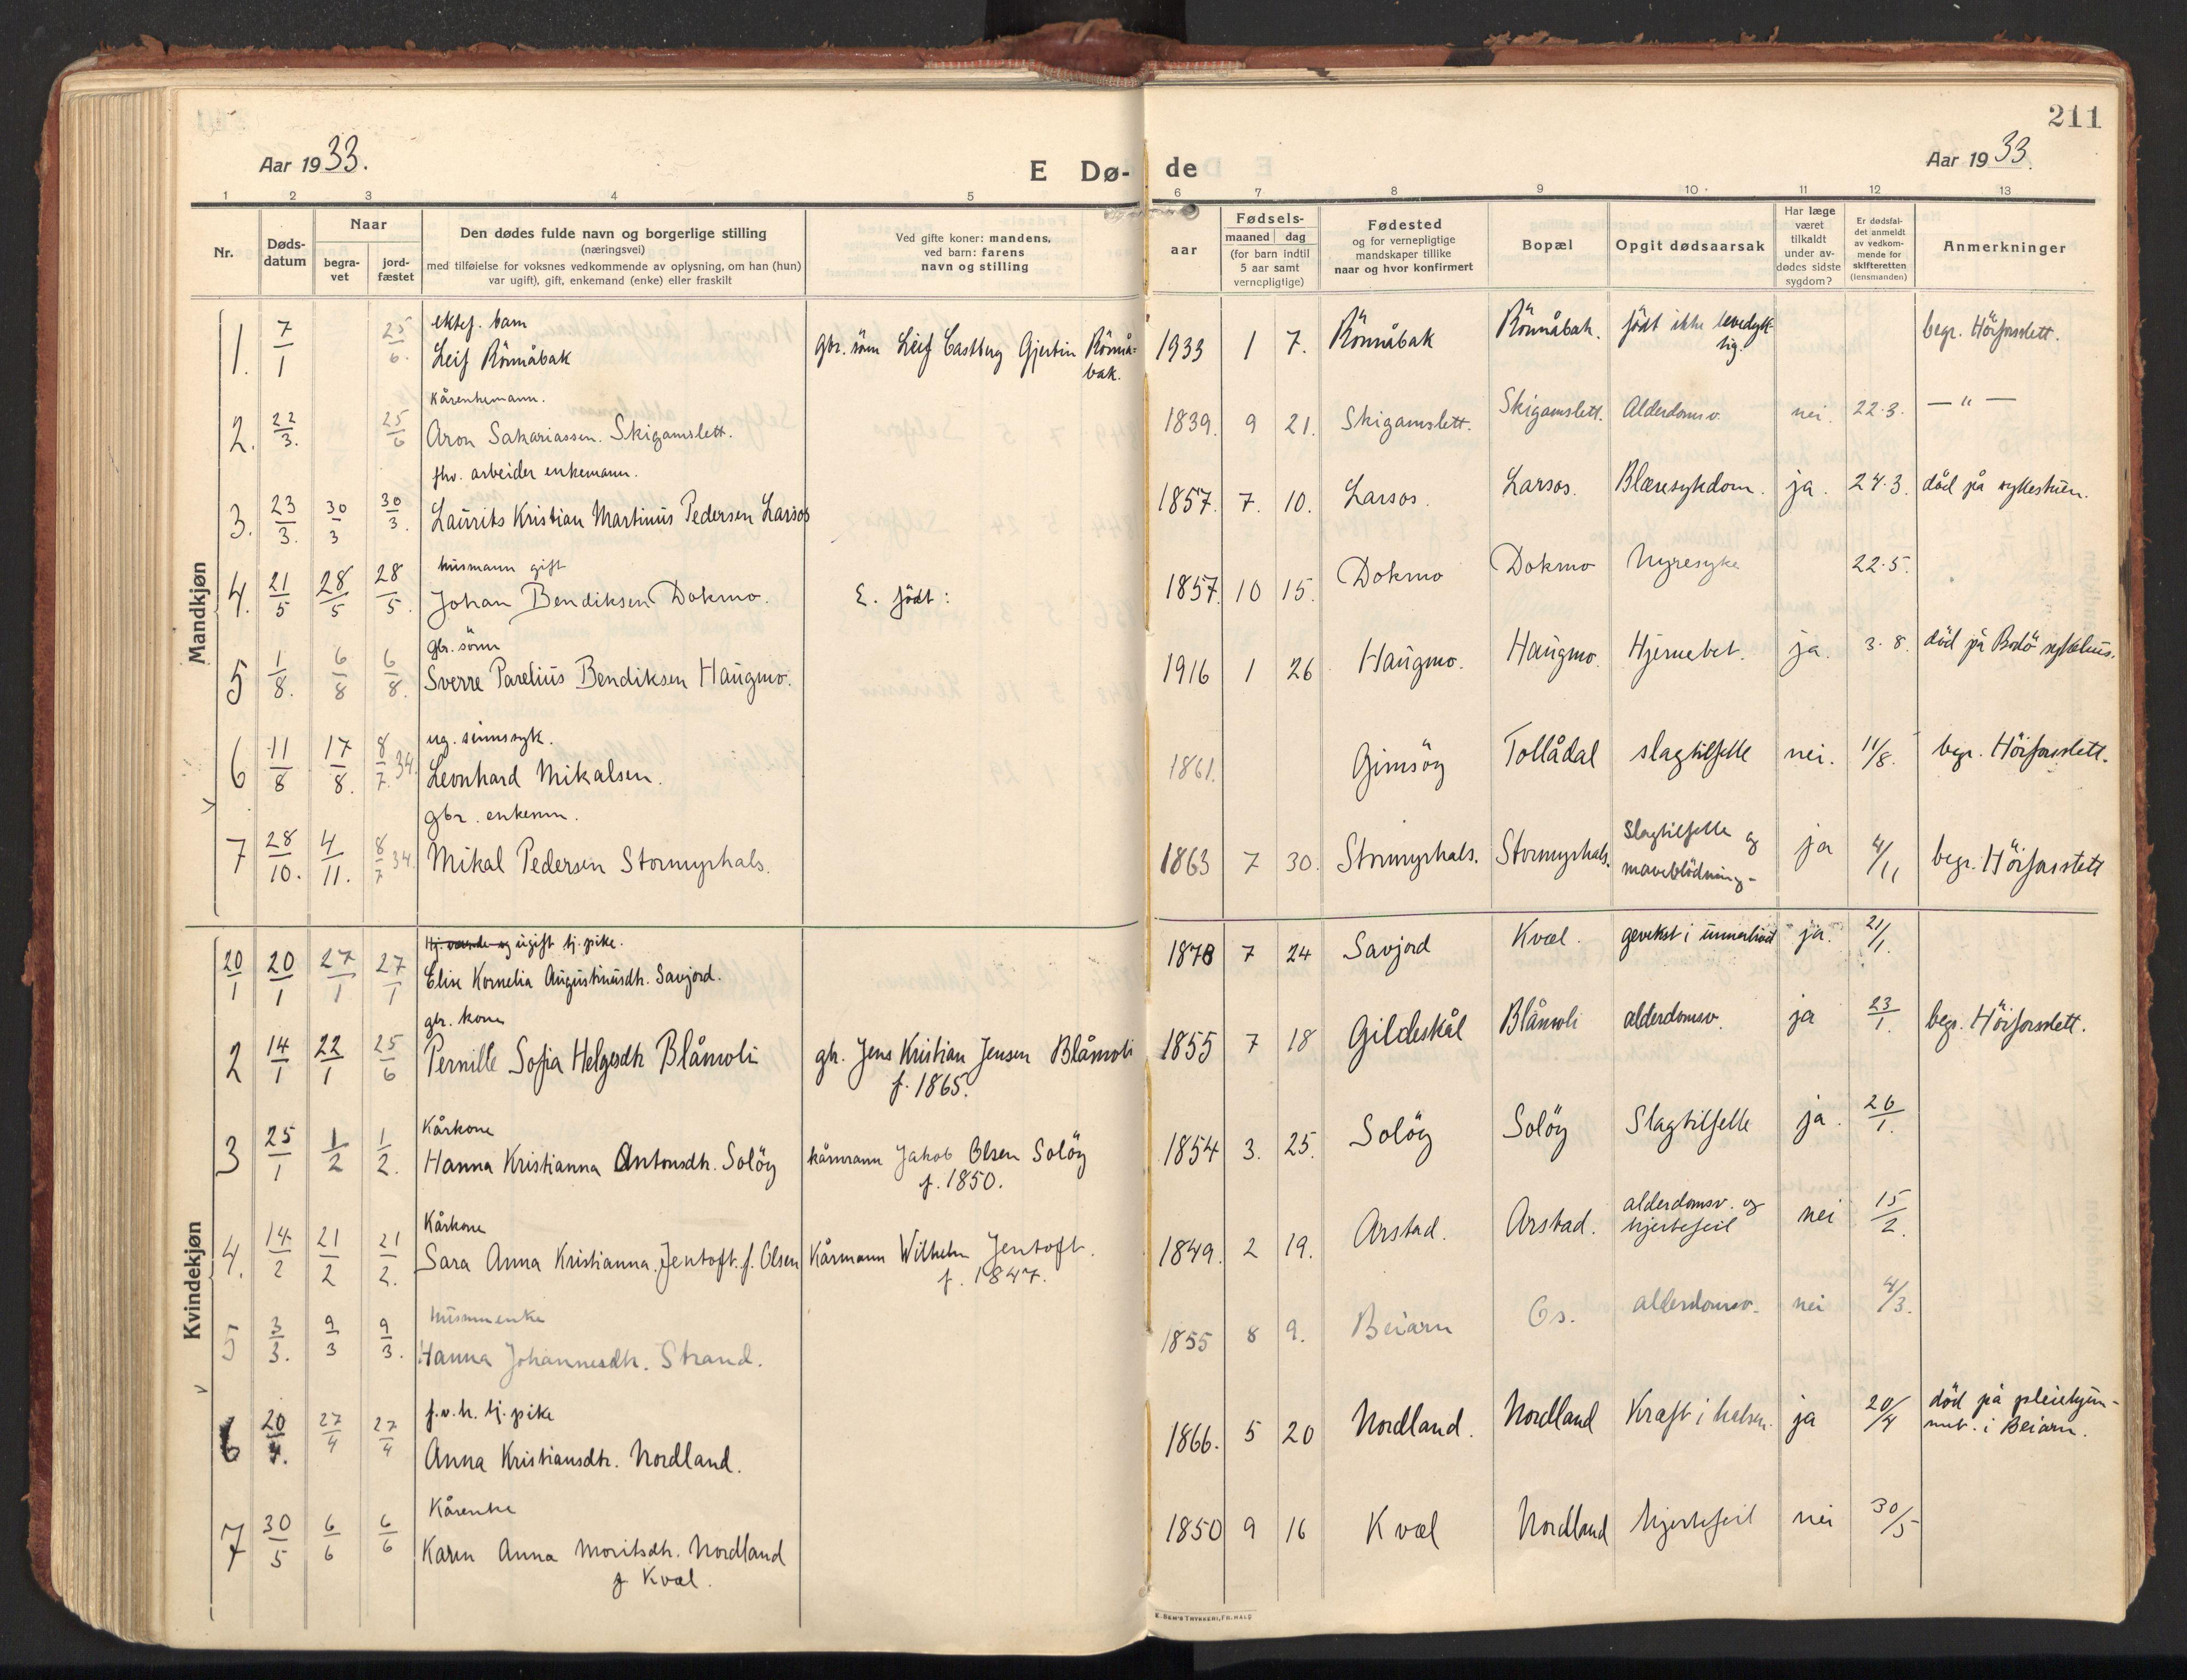 SAT, Ministerialprotokoller, klokkerbøker og fødselsregistre - Nordland, 846/L0650: Ministerialbok nr. 846A08, 1916-1935, s. 211